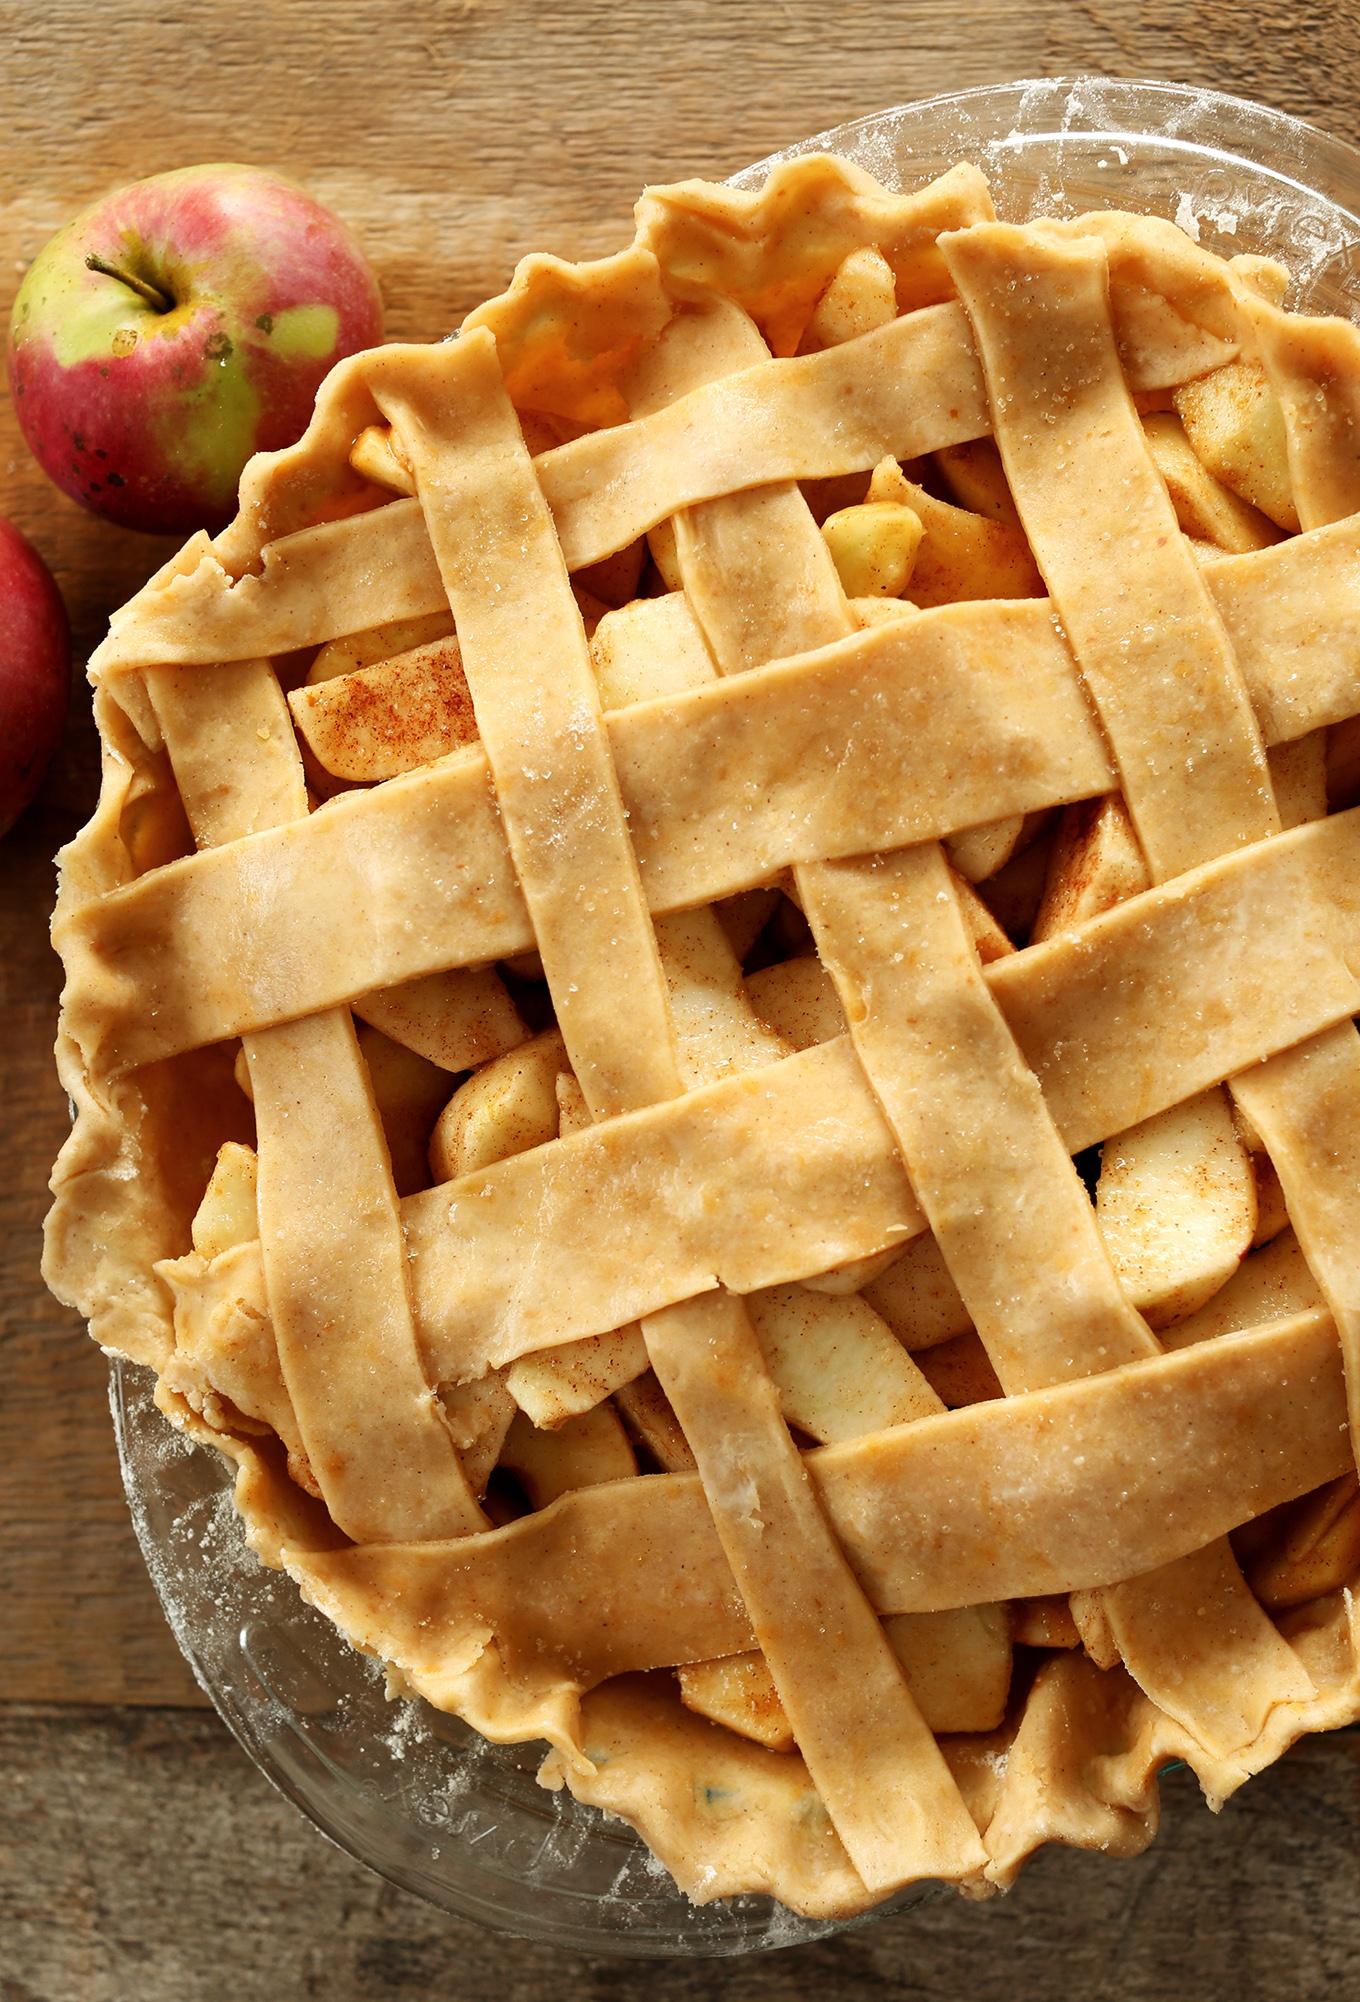 Delicious vegan Pumpkin Spiced Apple Pie with a lattice top